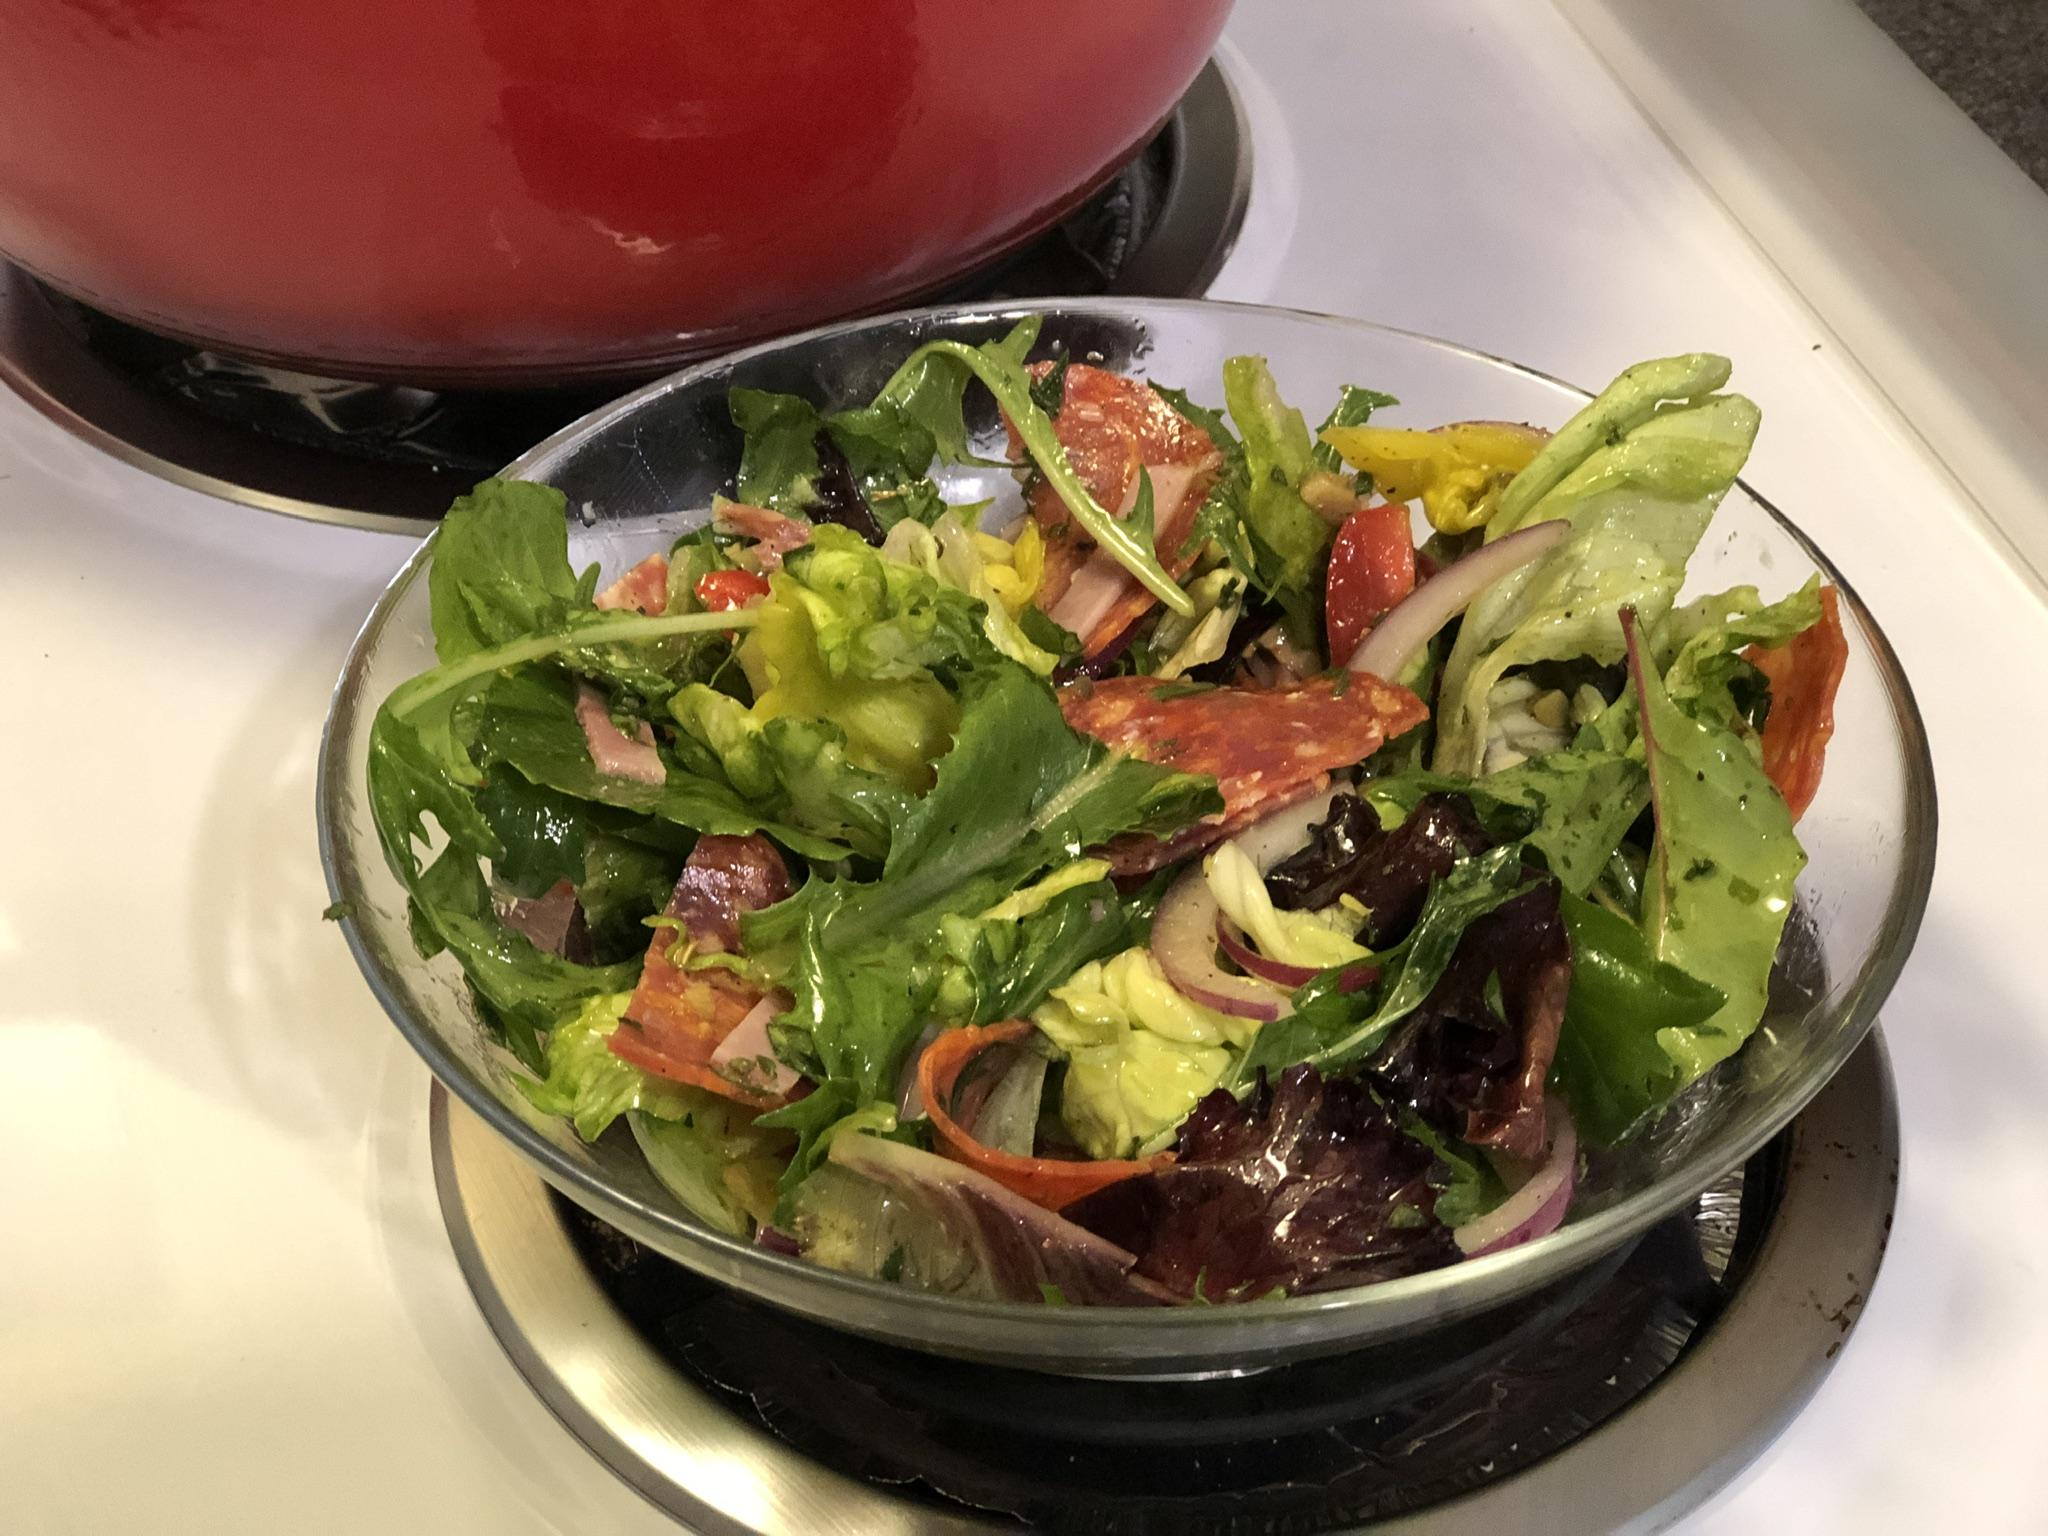 Low Carb Keto Italian Sub Salad